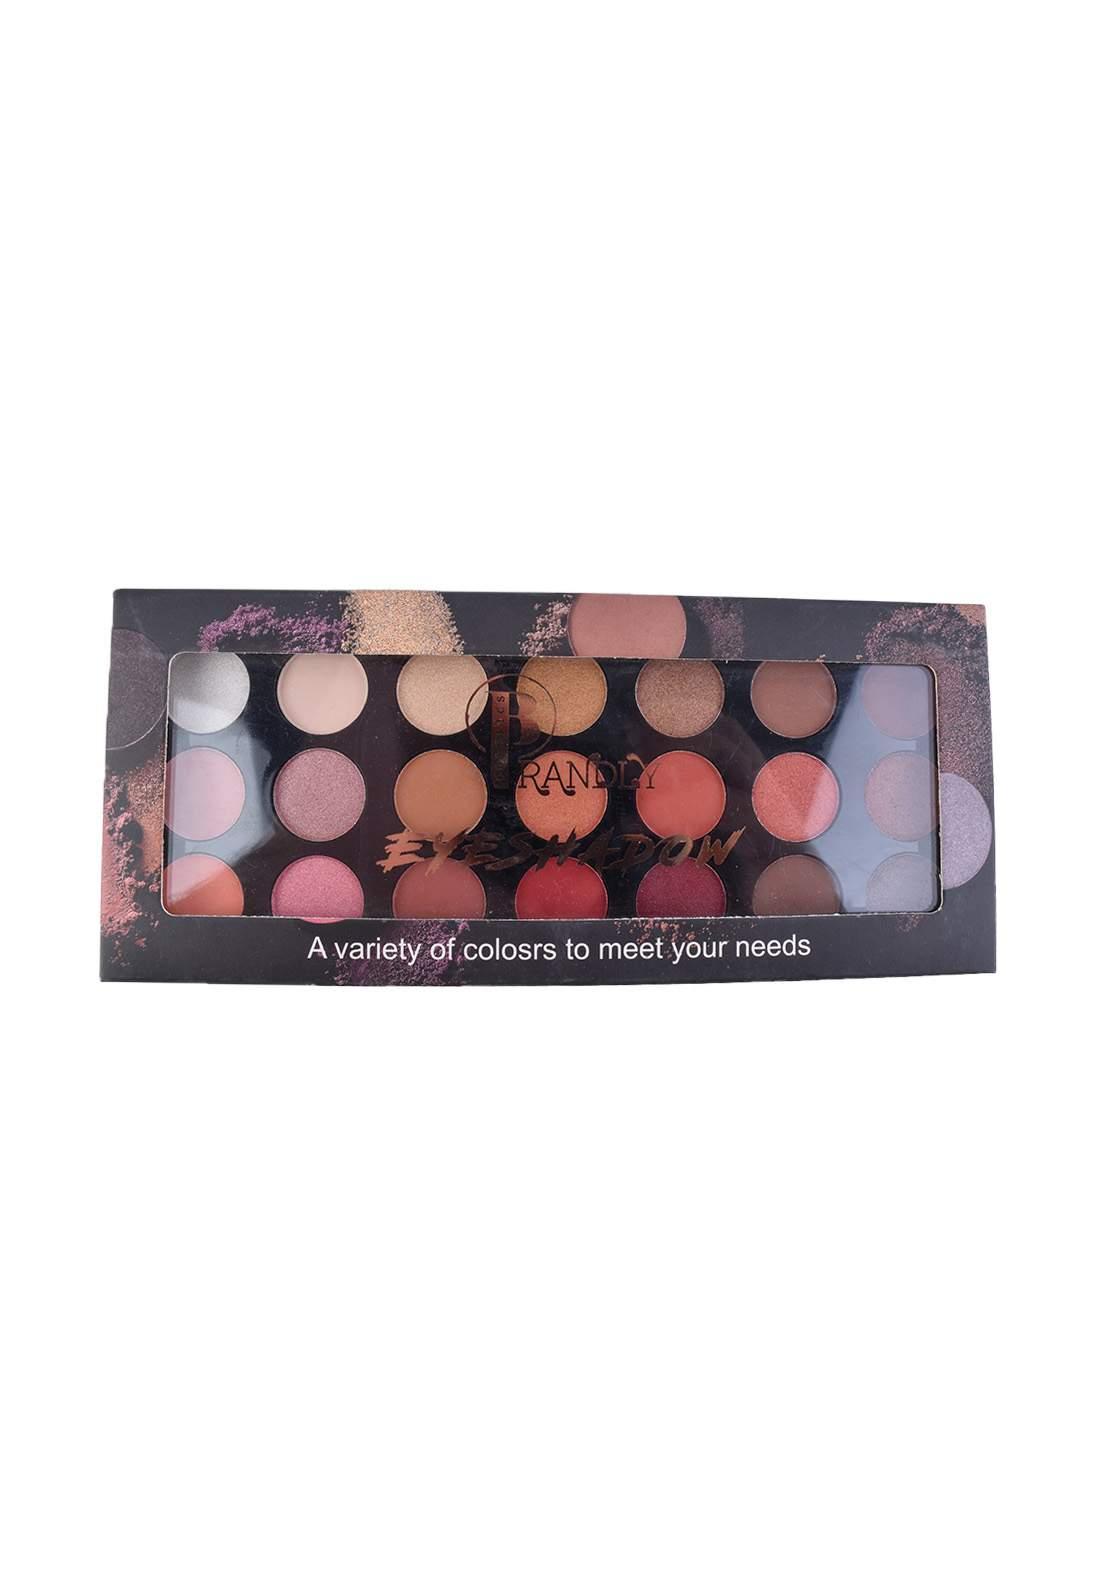 Brandly Cosmetics Eyeshadow Palette No.1 ظلال عيون